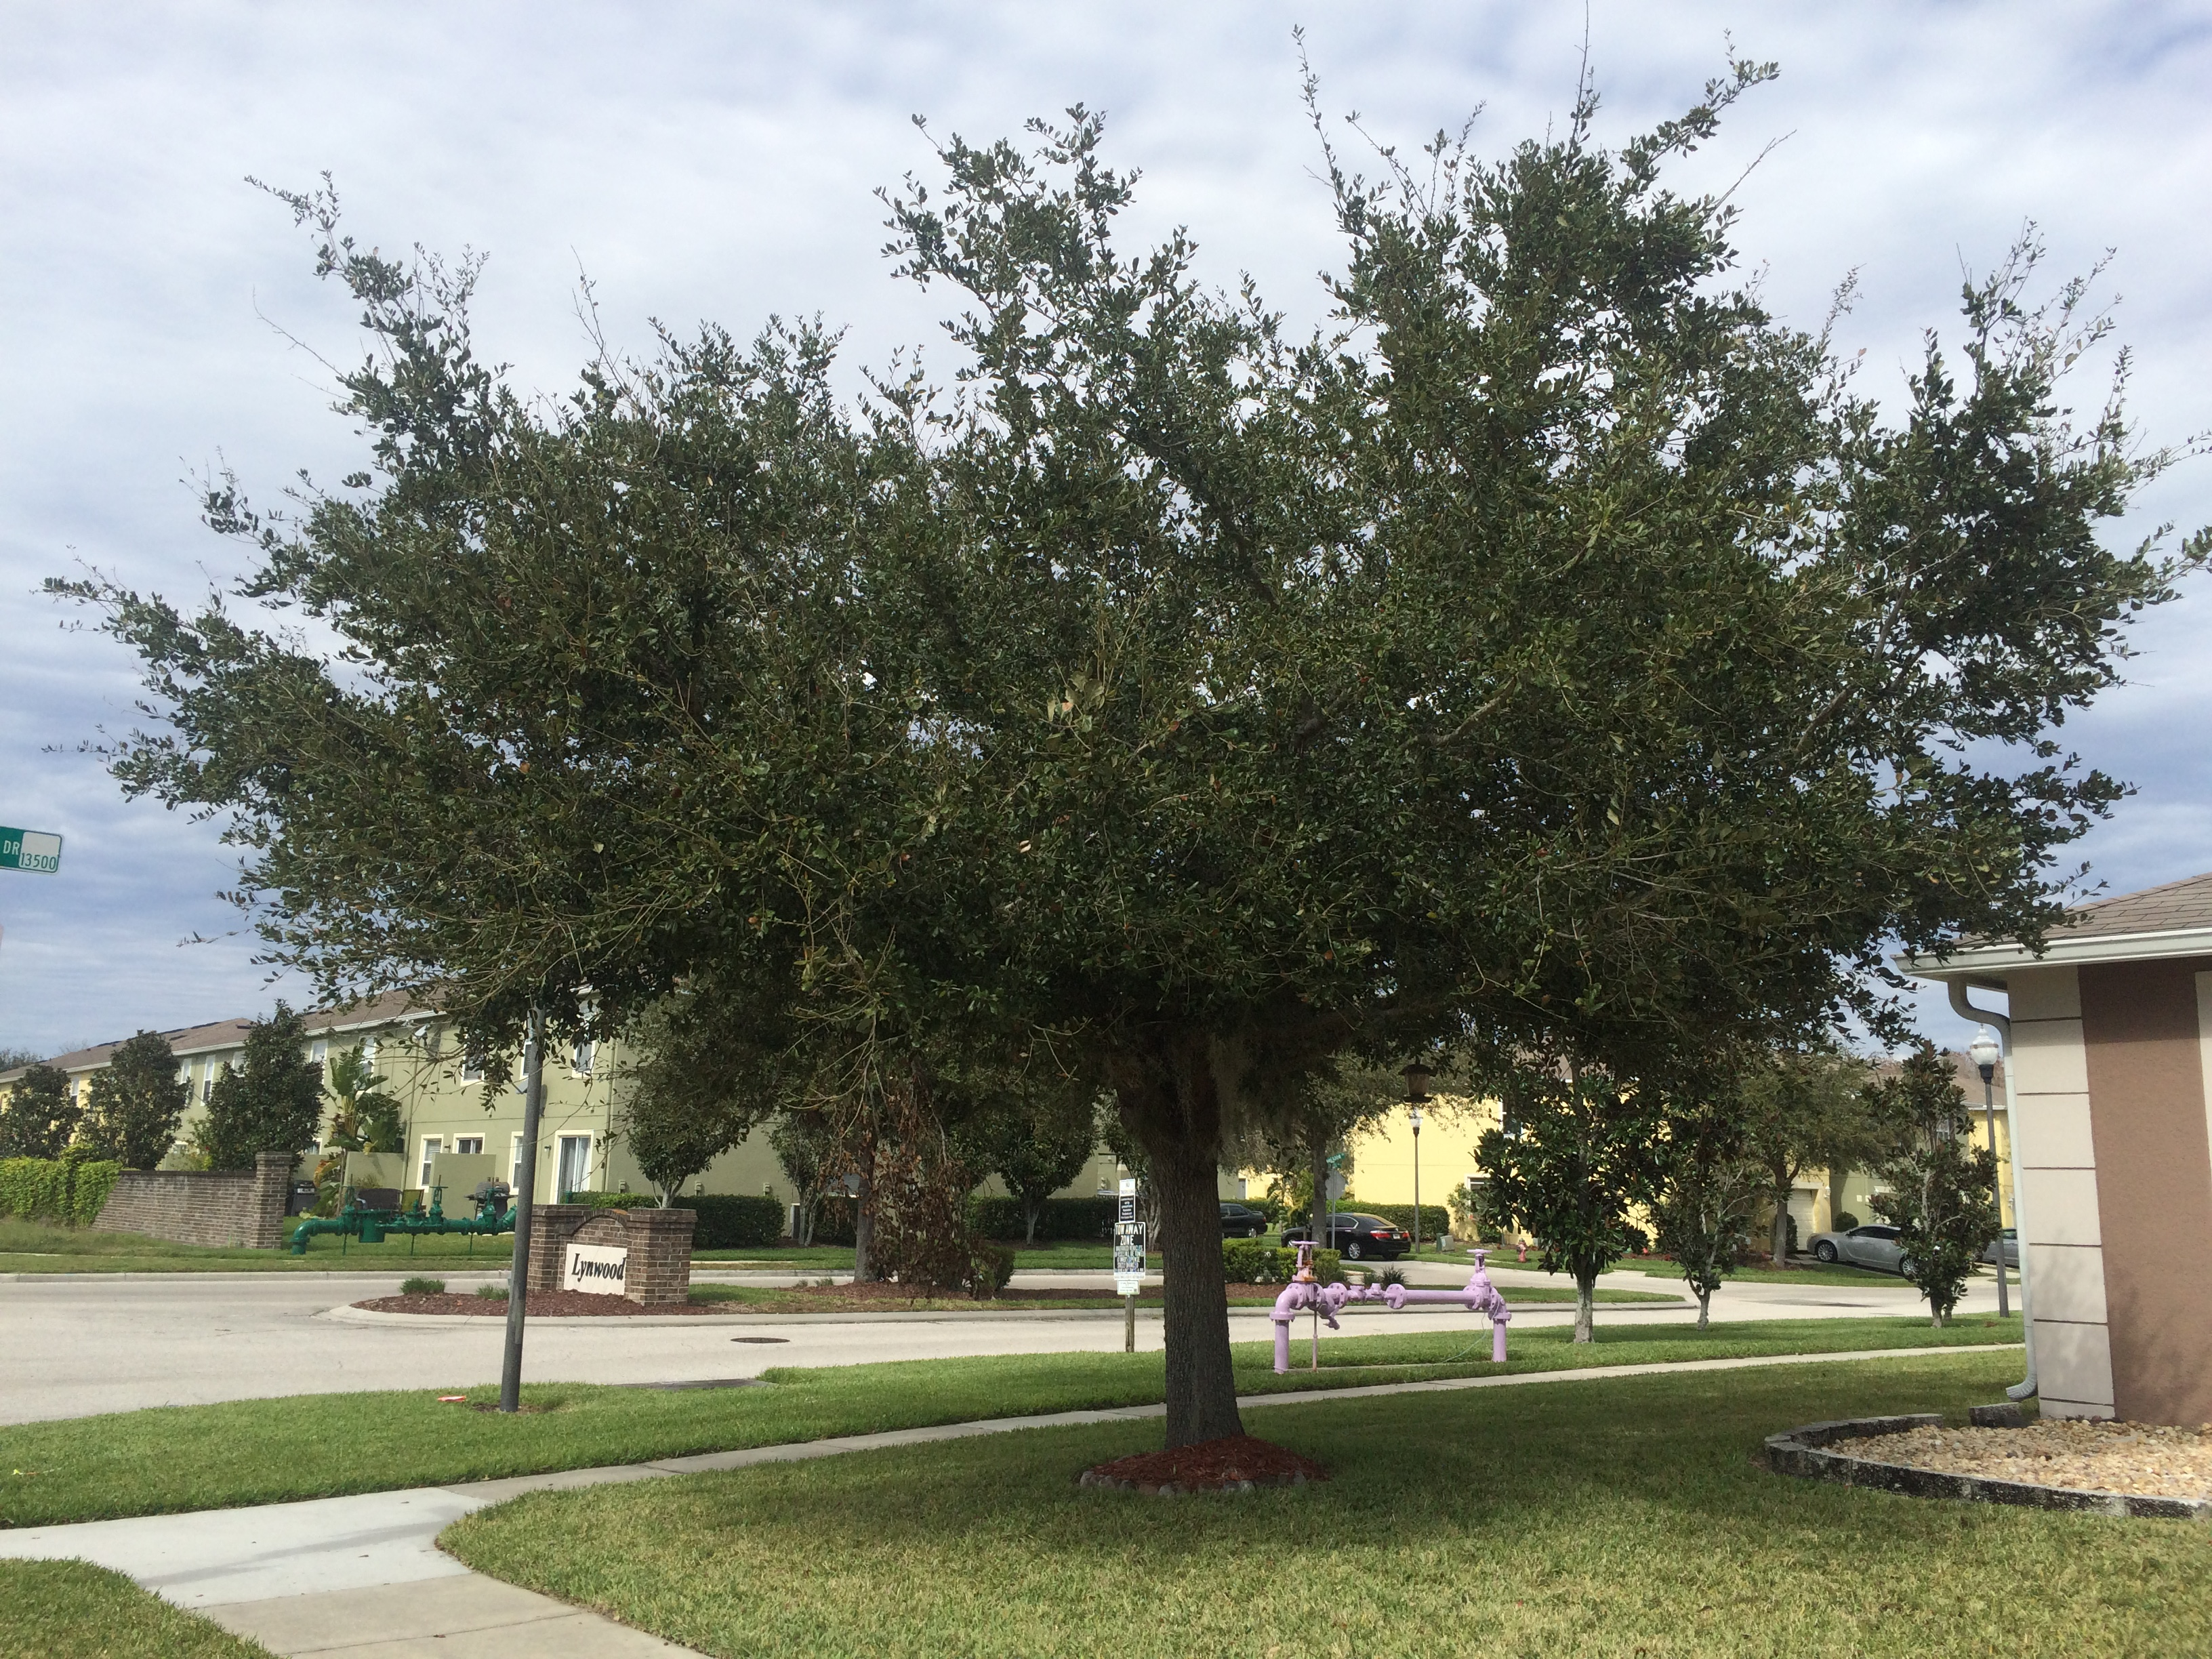 Lawn Care Service in Winter Garden, FL, 34787